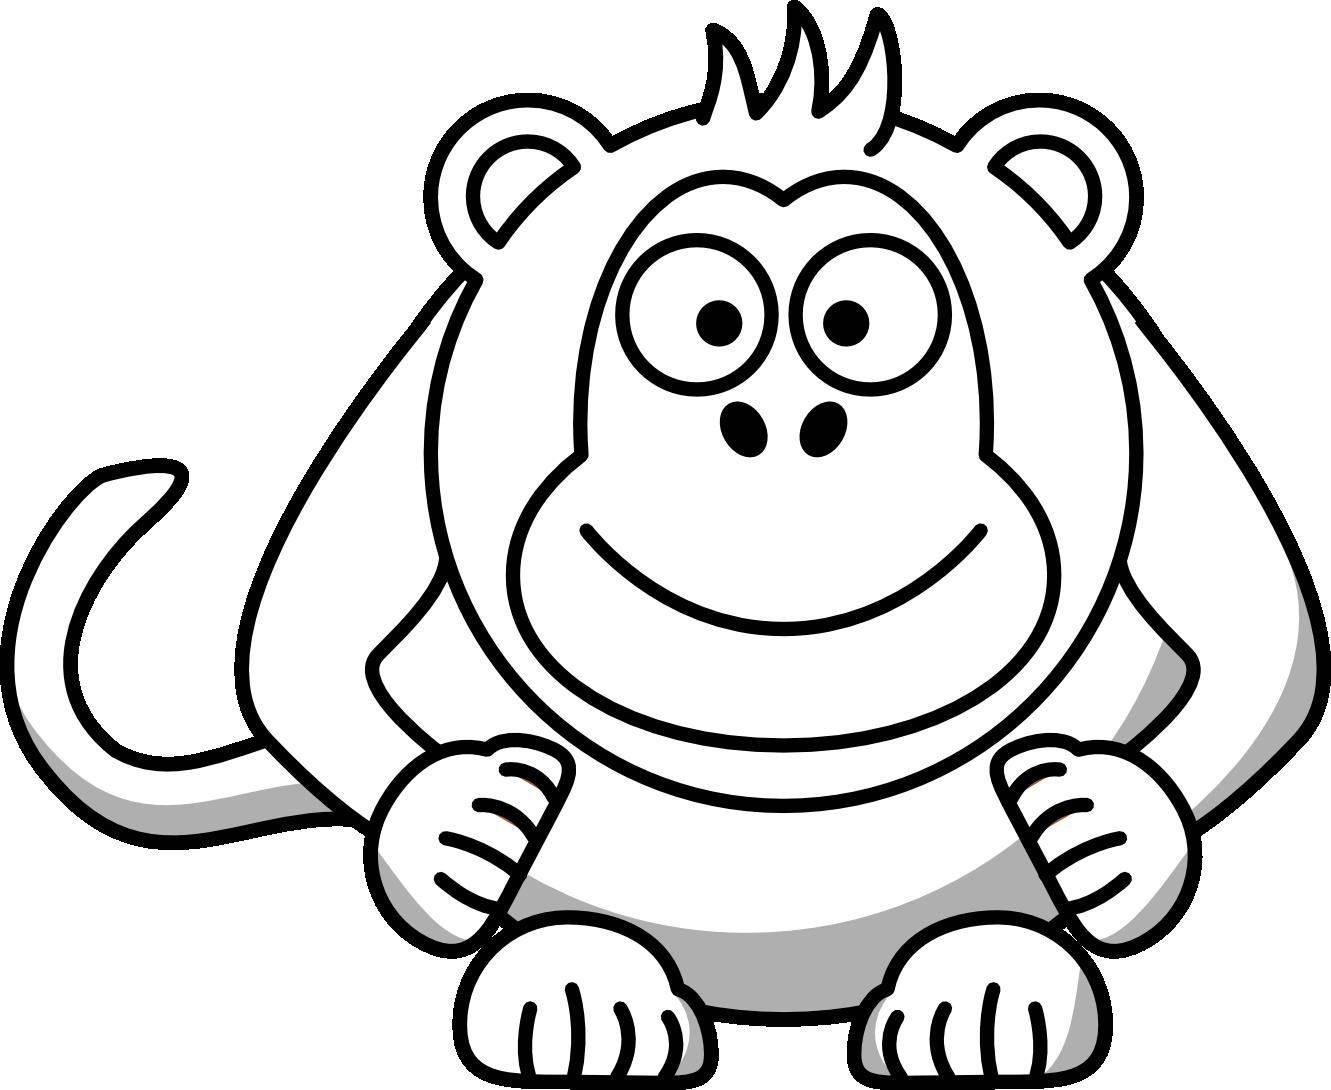 1331x1090 Monkey Clipart Black And White